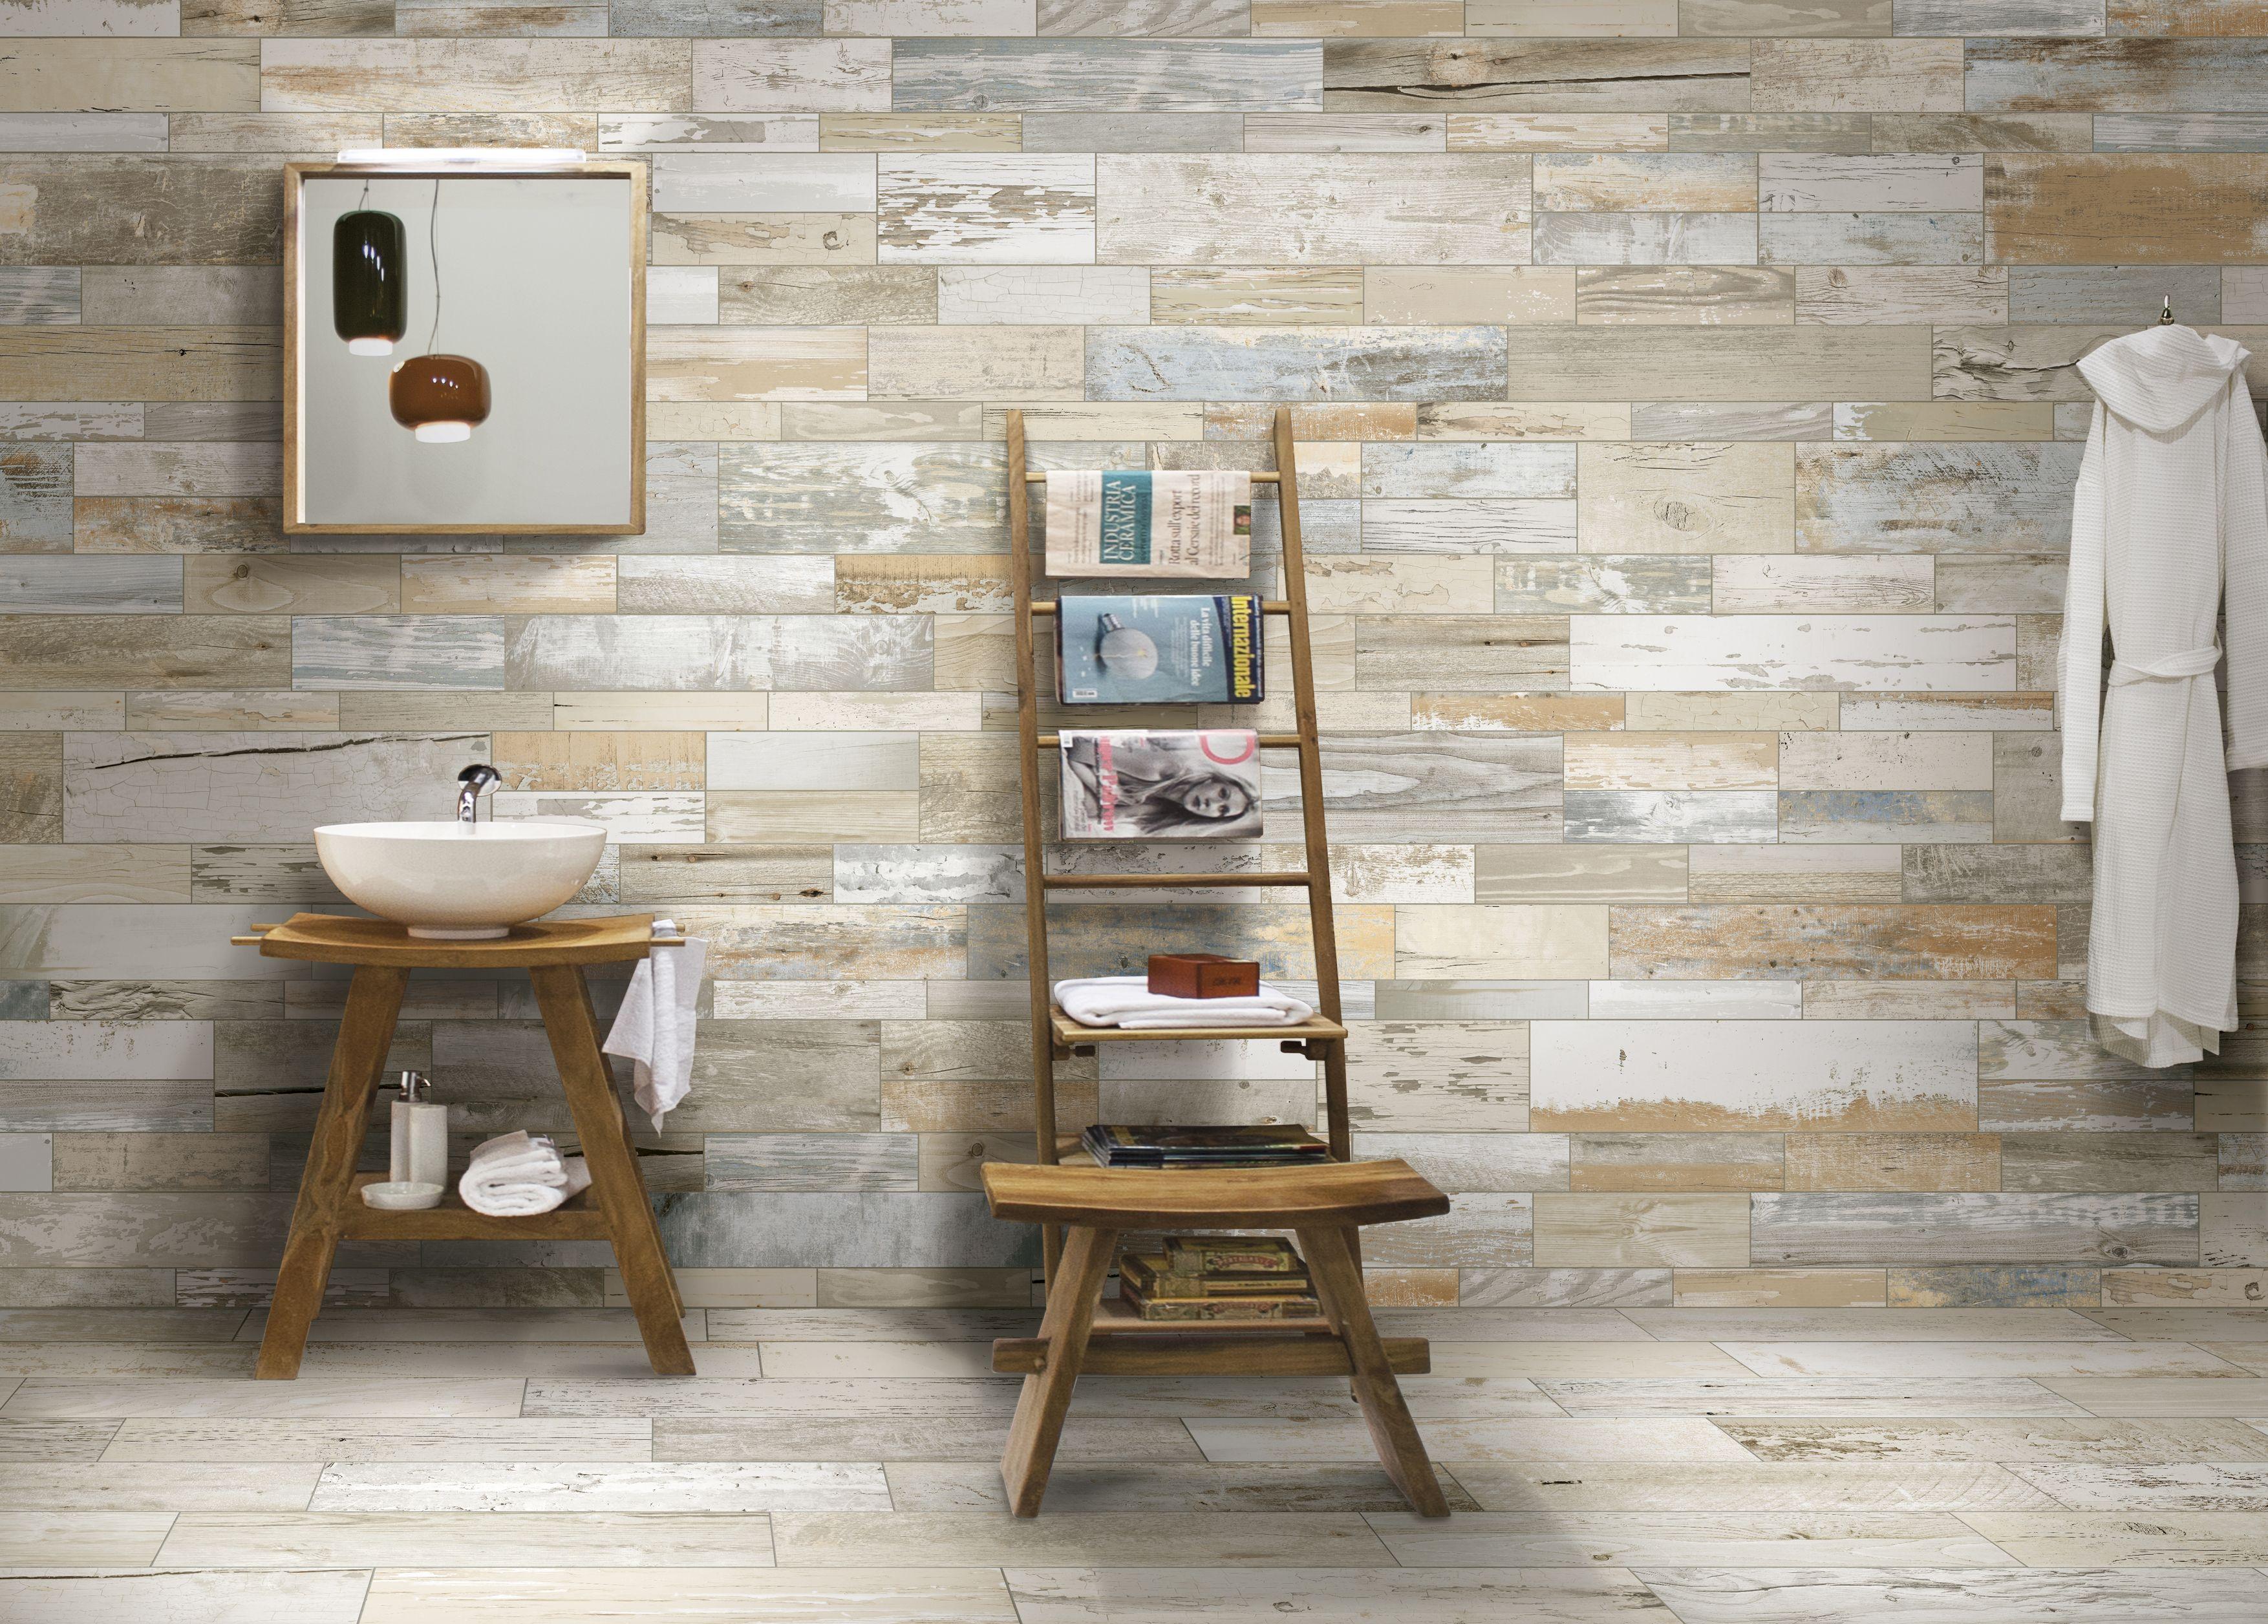 vloertegels i wandtegels i badkamer i keuken i wood look vloeren